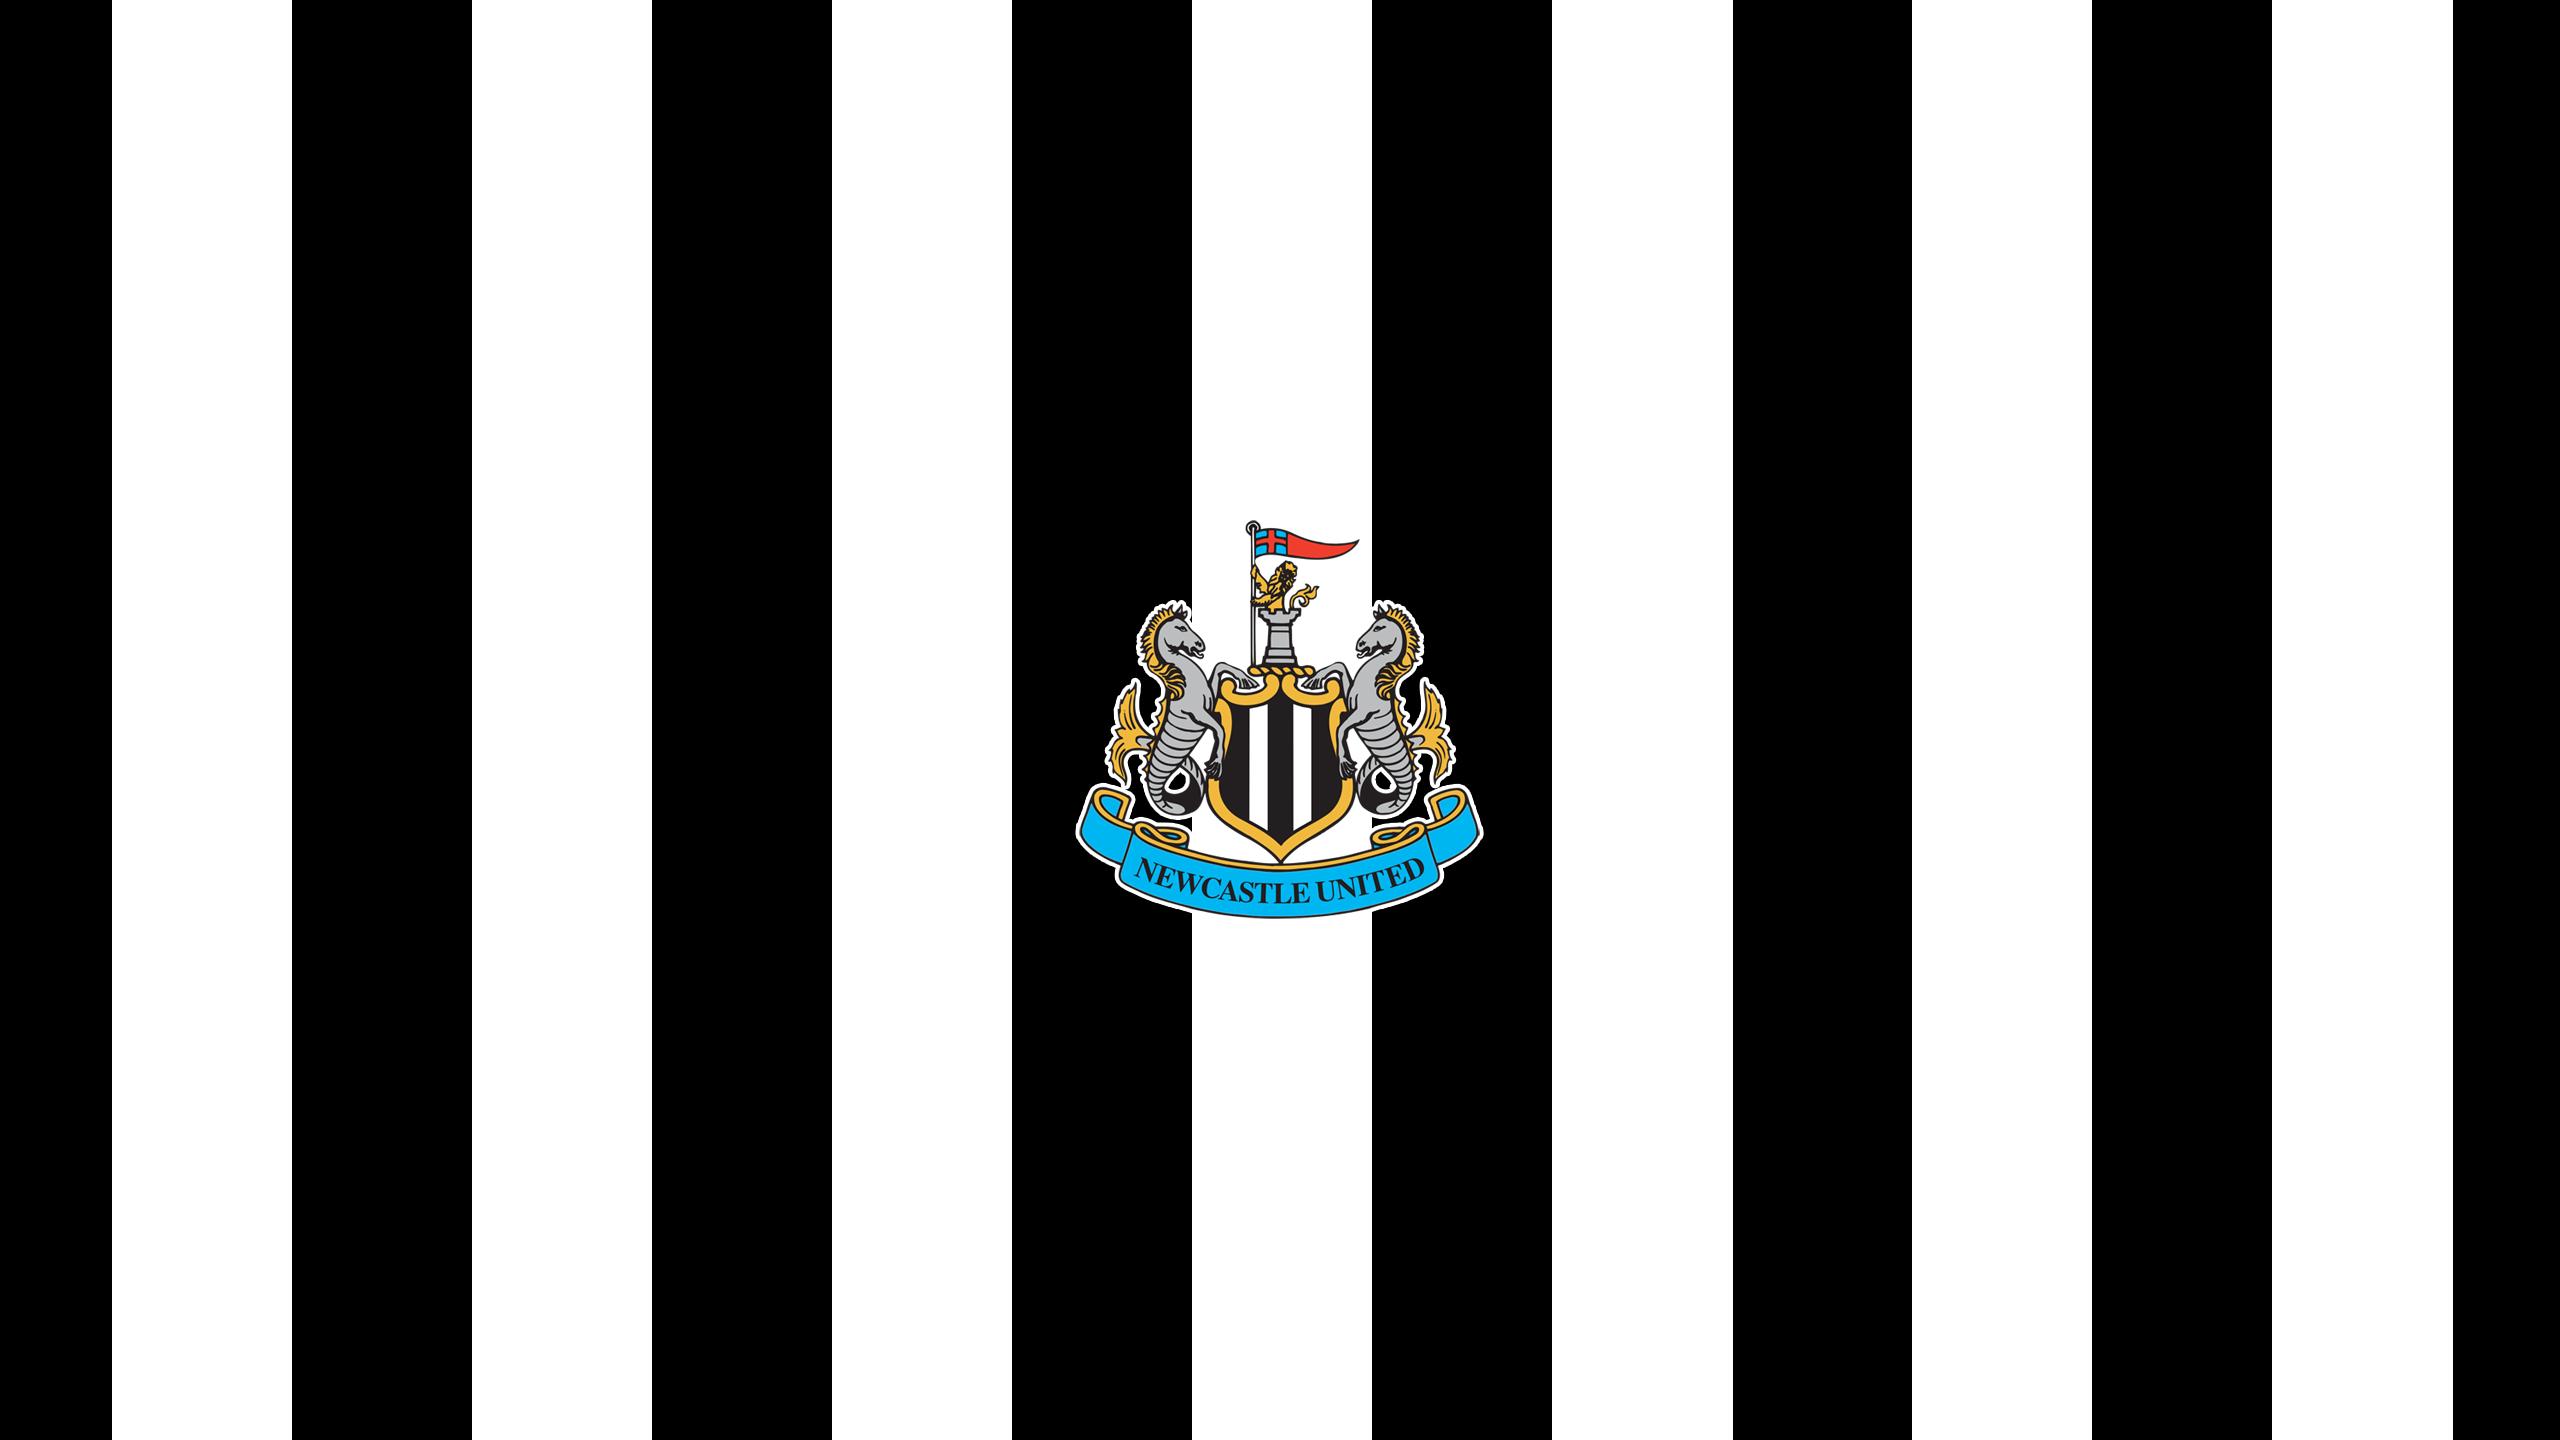 Newcastle United FC Stephen Clark sgclarkcom PL   Newcastle 2560x1440